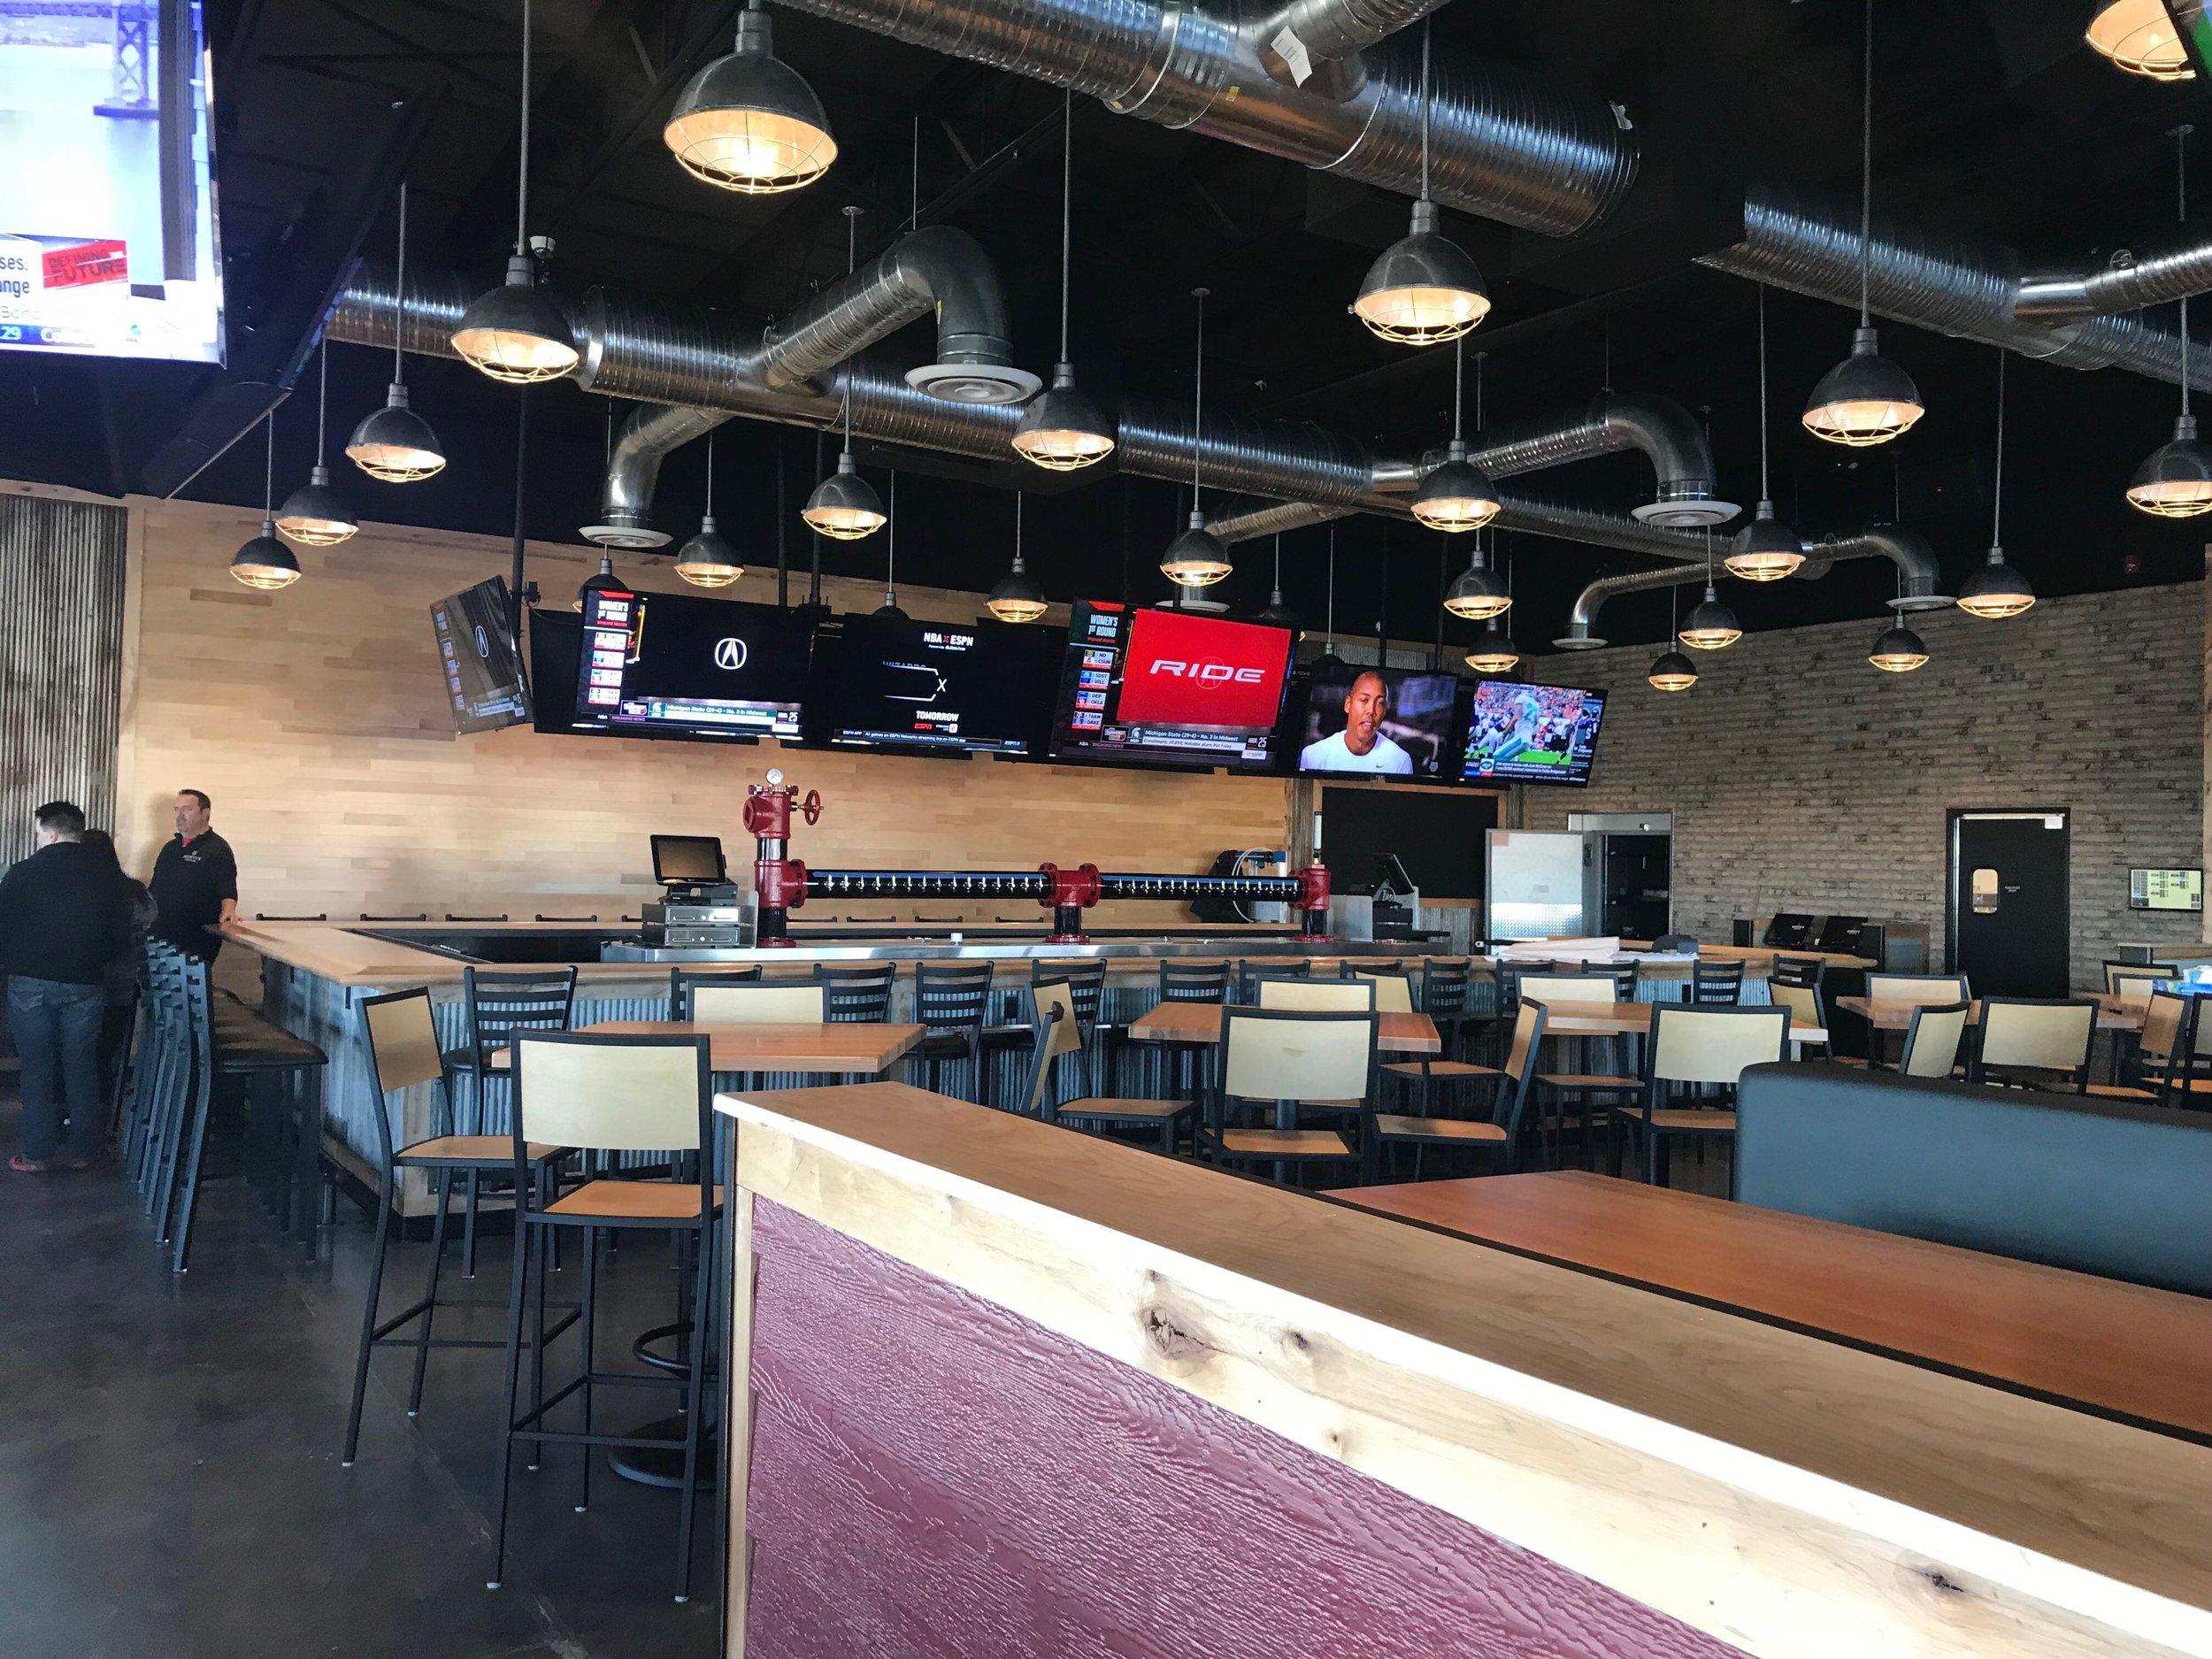 Scotty's Brewhouse - Poplar Bluff, Missouri